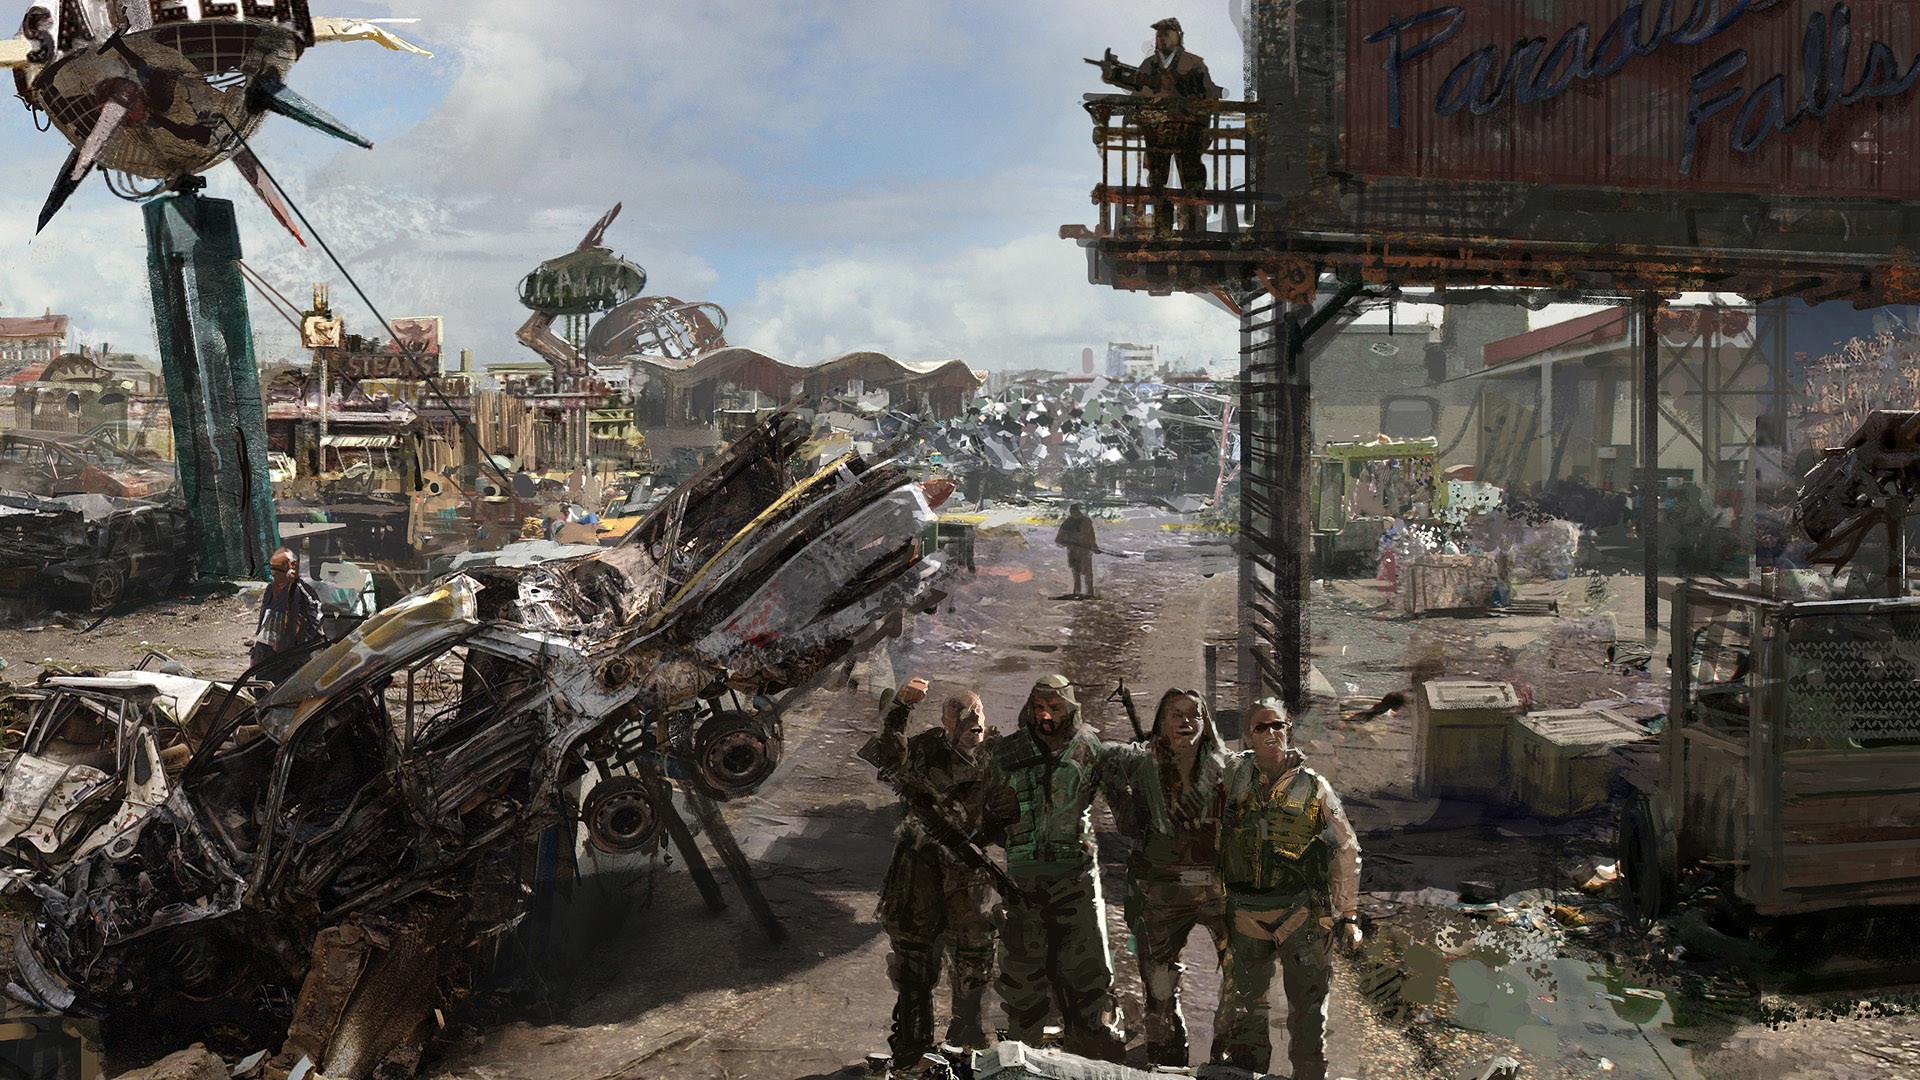 Fallout 4 Concept Art Wallpaper (74+ images)